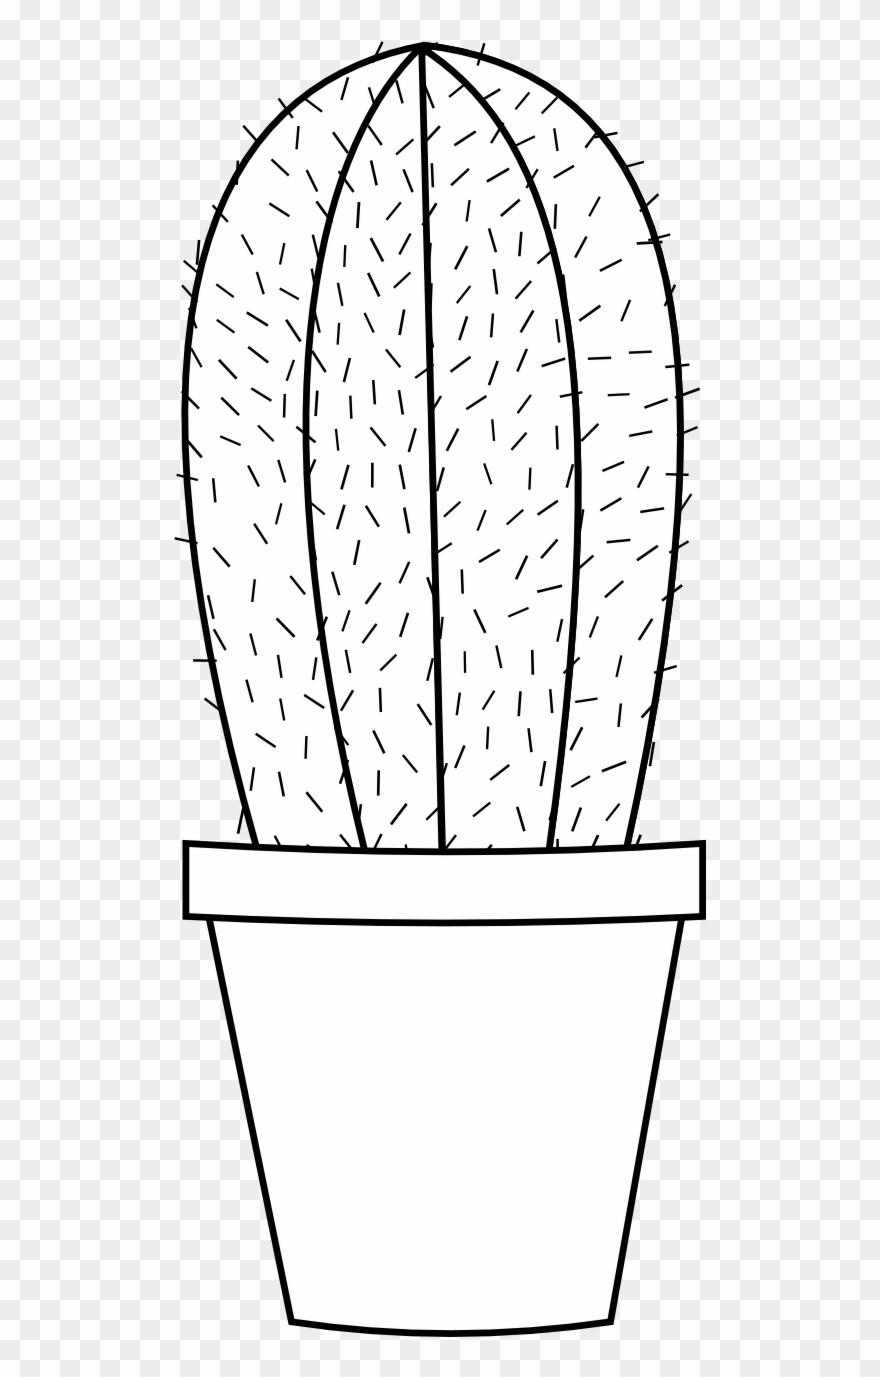 Cactus 16 Black White Line Art Flower Scalable Vector.